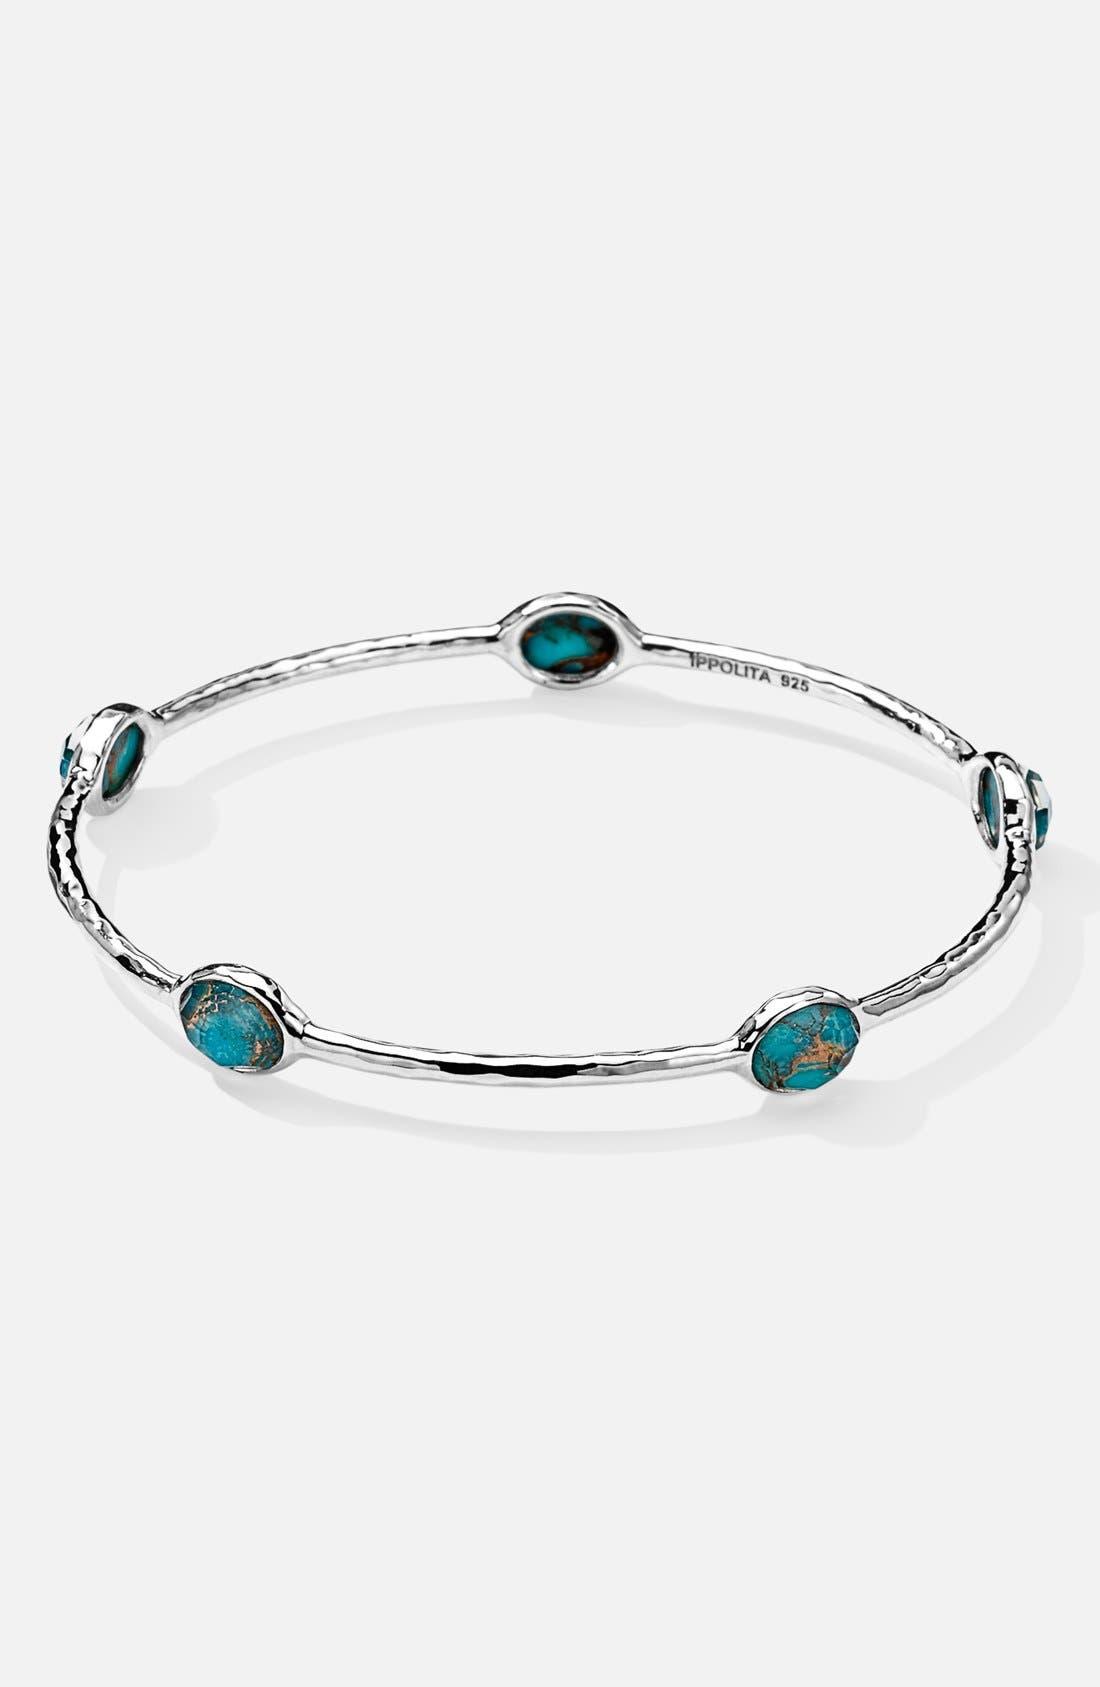 Alternate Image 1 Selected - Ippolita 'Rock Candy' 5-Stone Blue Topaz Bangle (Online Only)